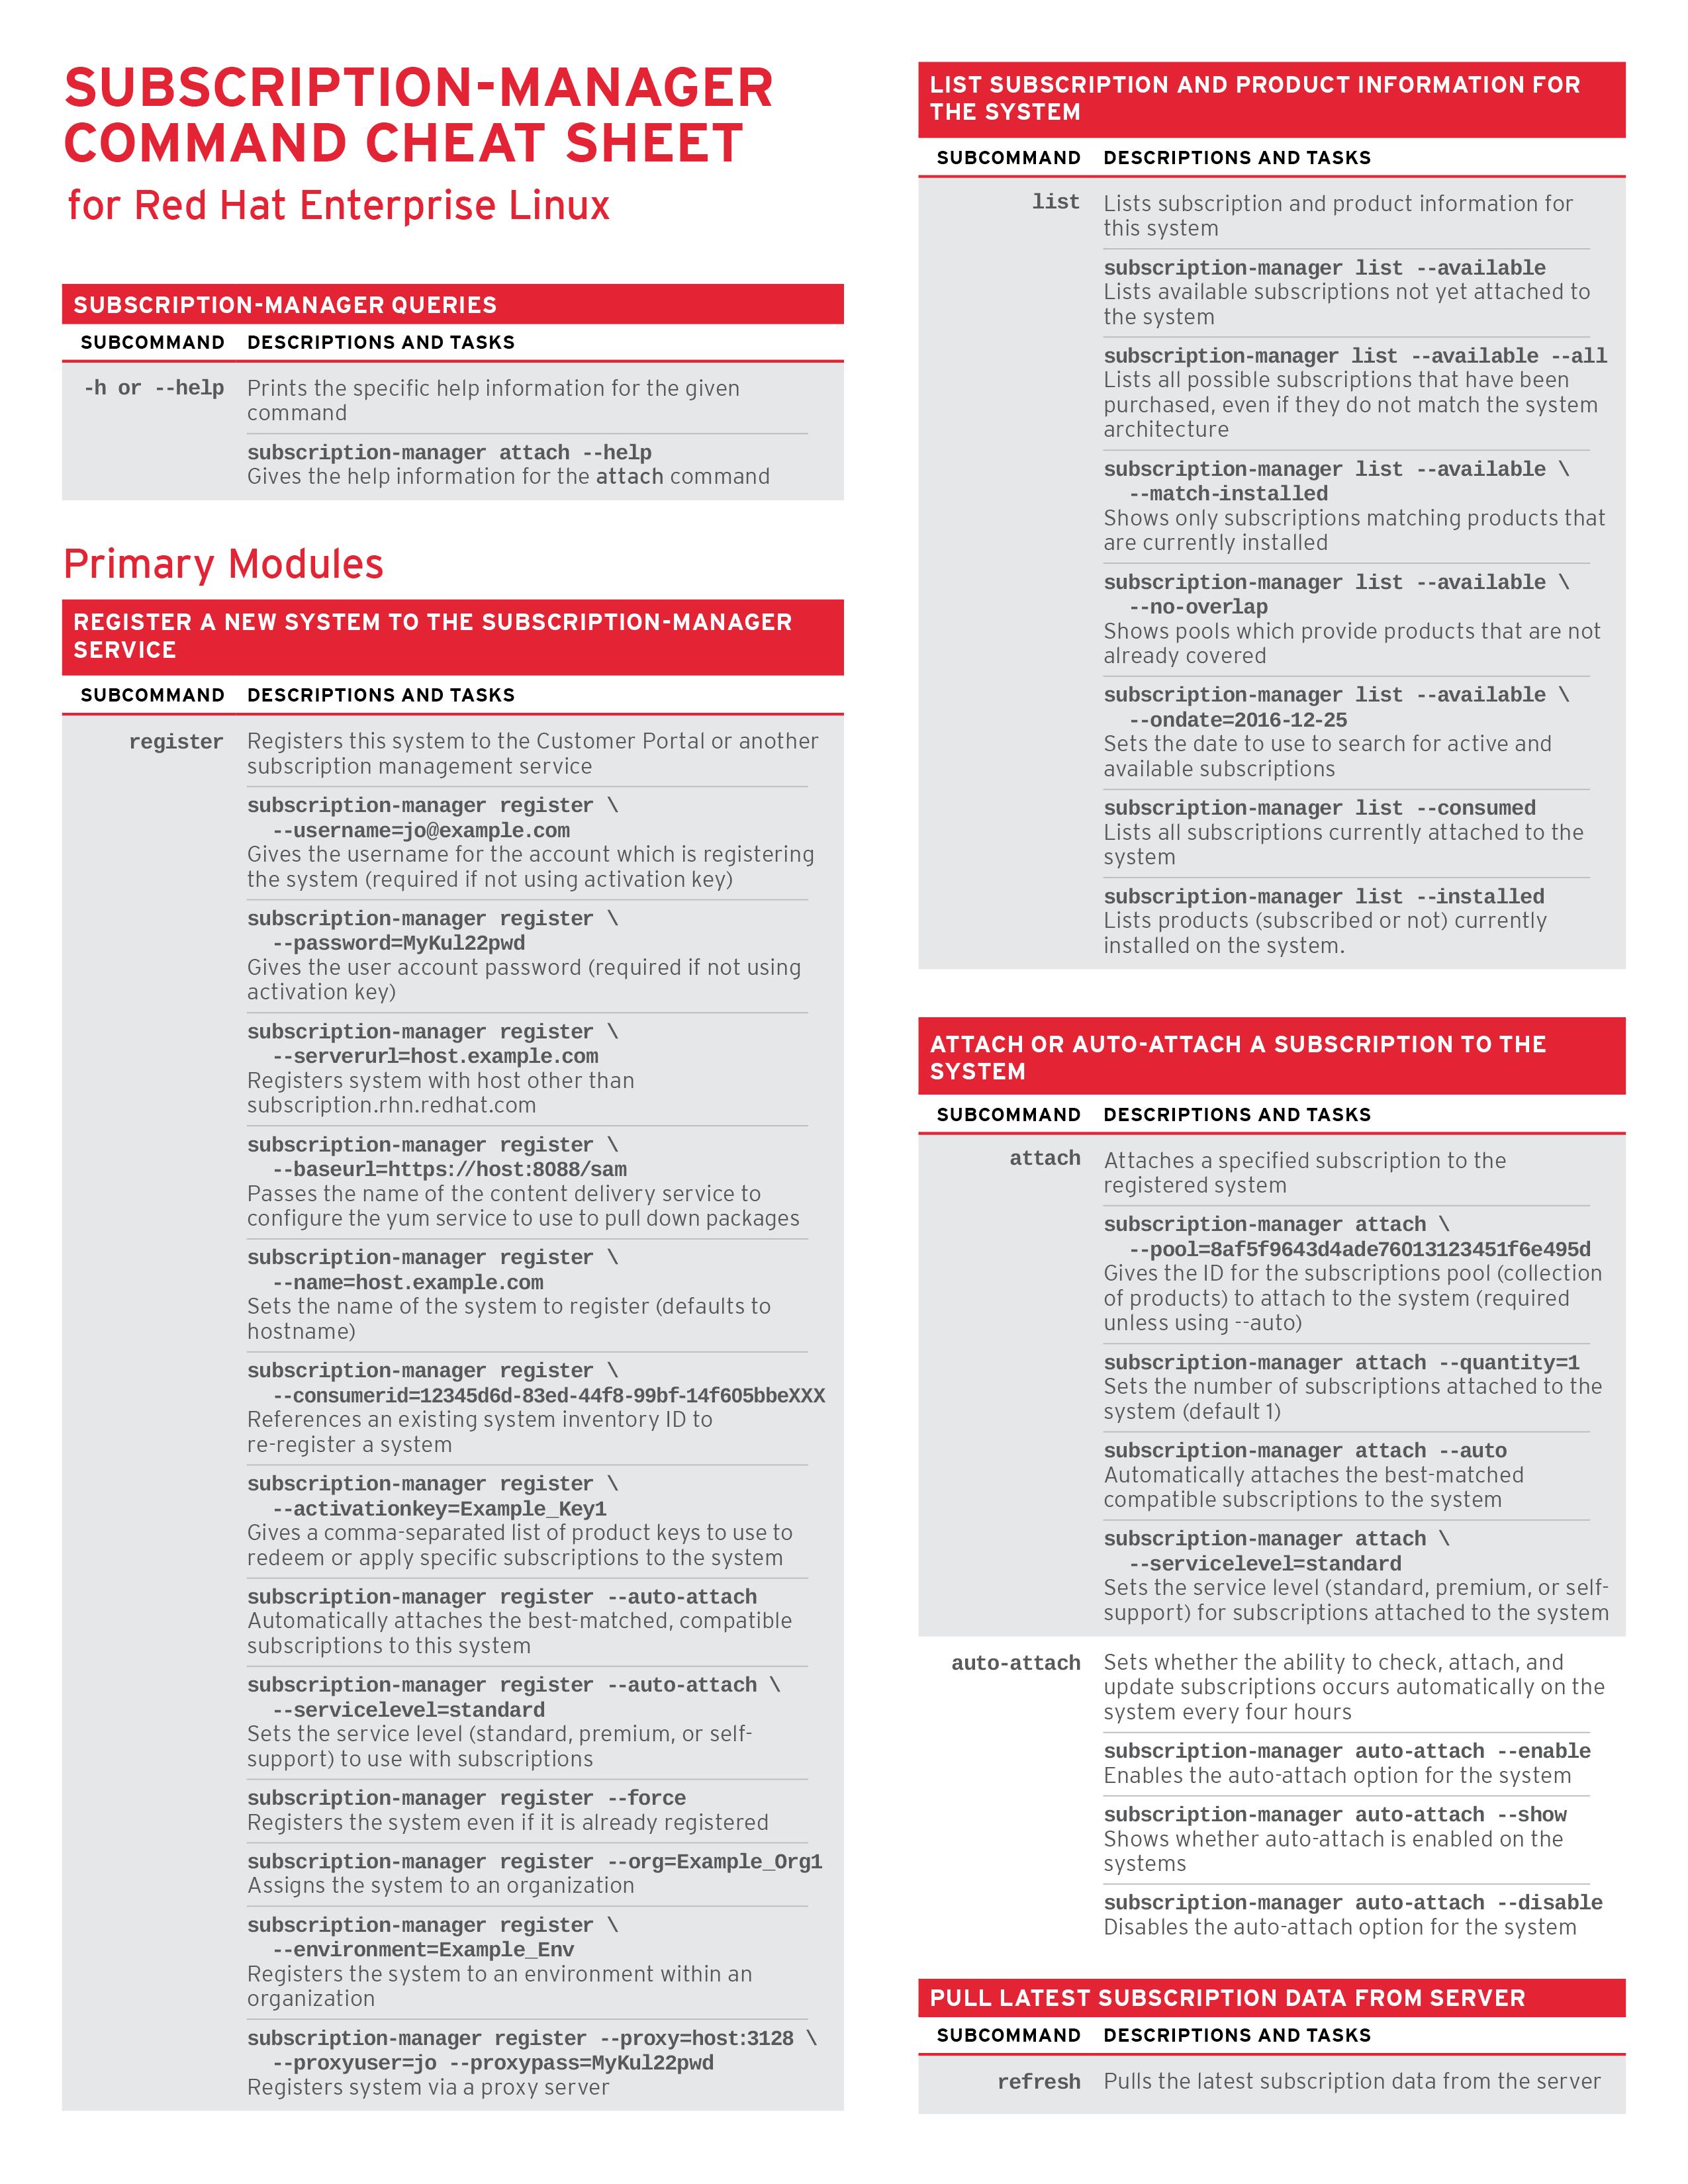 Linux Bash Built-in Commands Cheat Sheet (PDF Image)